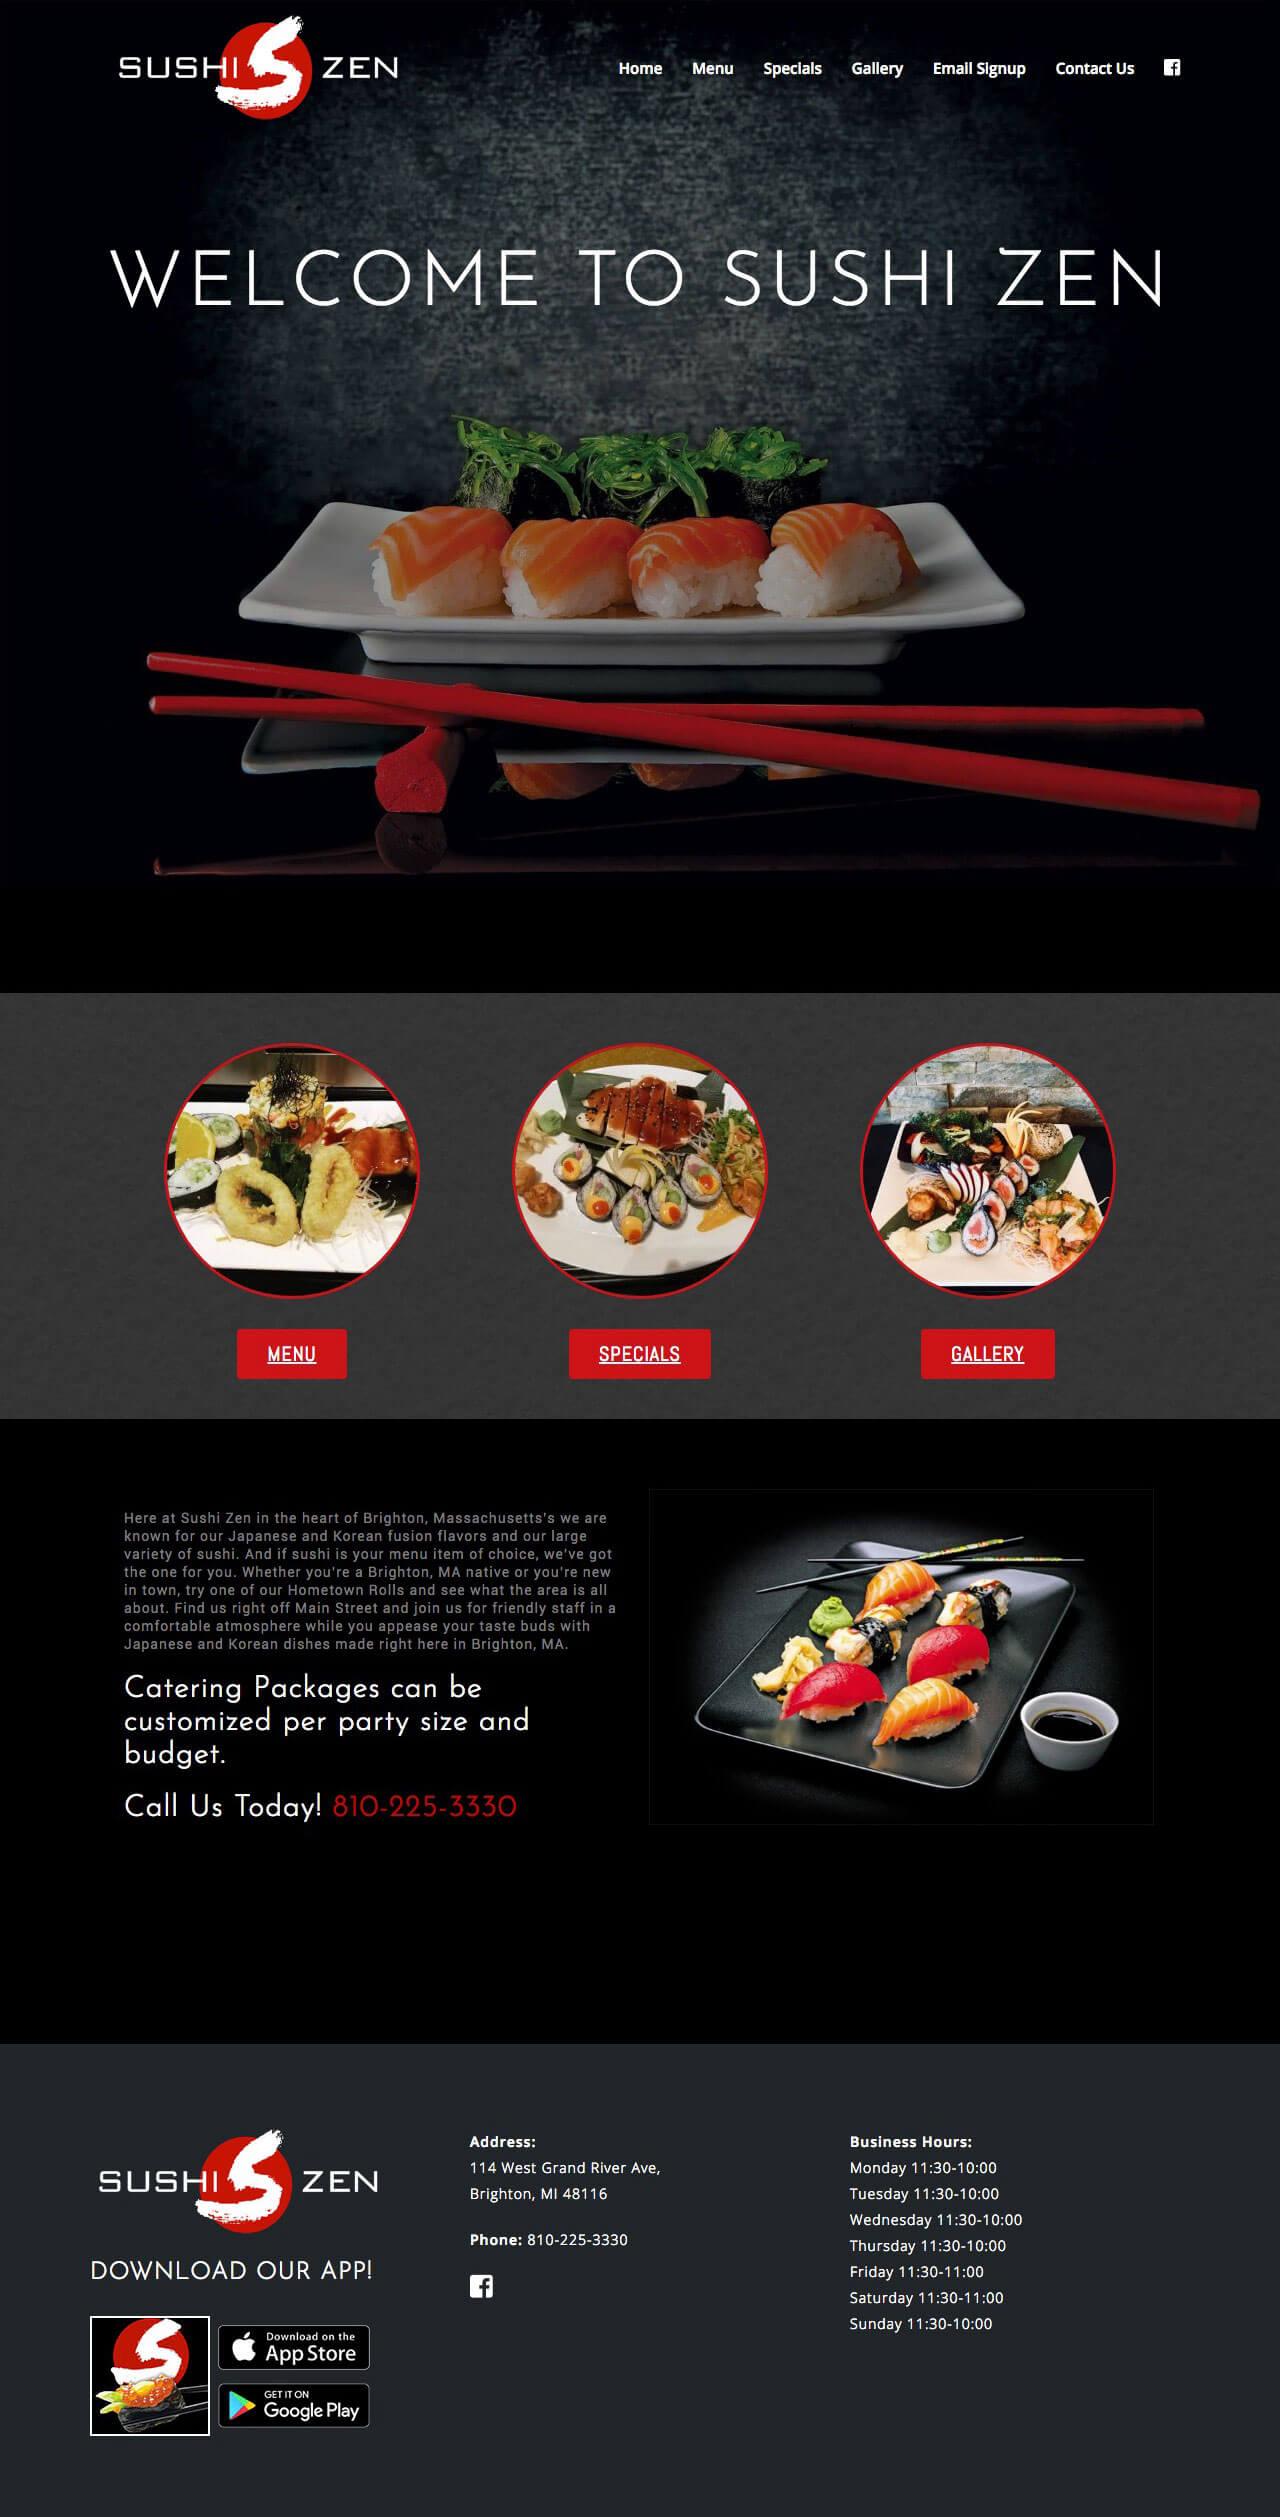 Sushi Zen - TLS Mobile Friendly Website